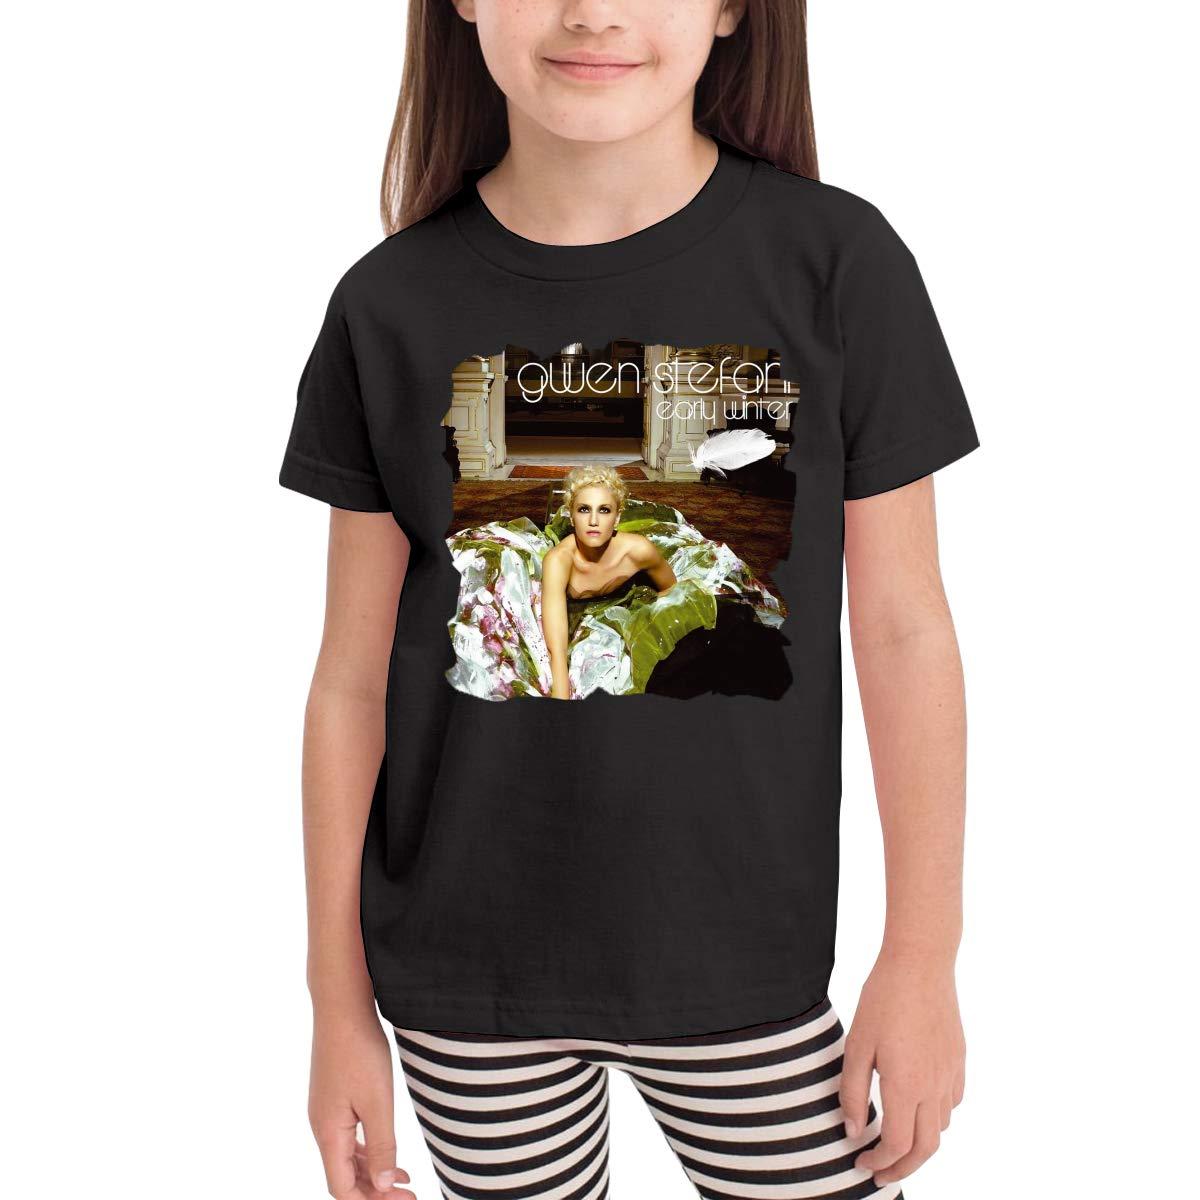 WYeter Gwen Stefani Early Winter Boys Girls Kids Funny Short Sleeve Tee Black